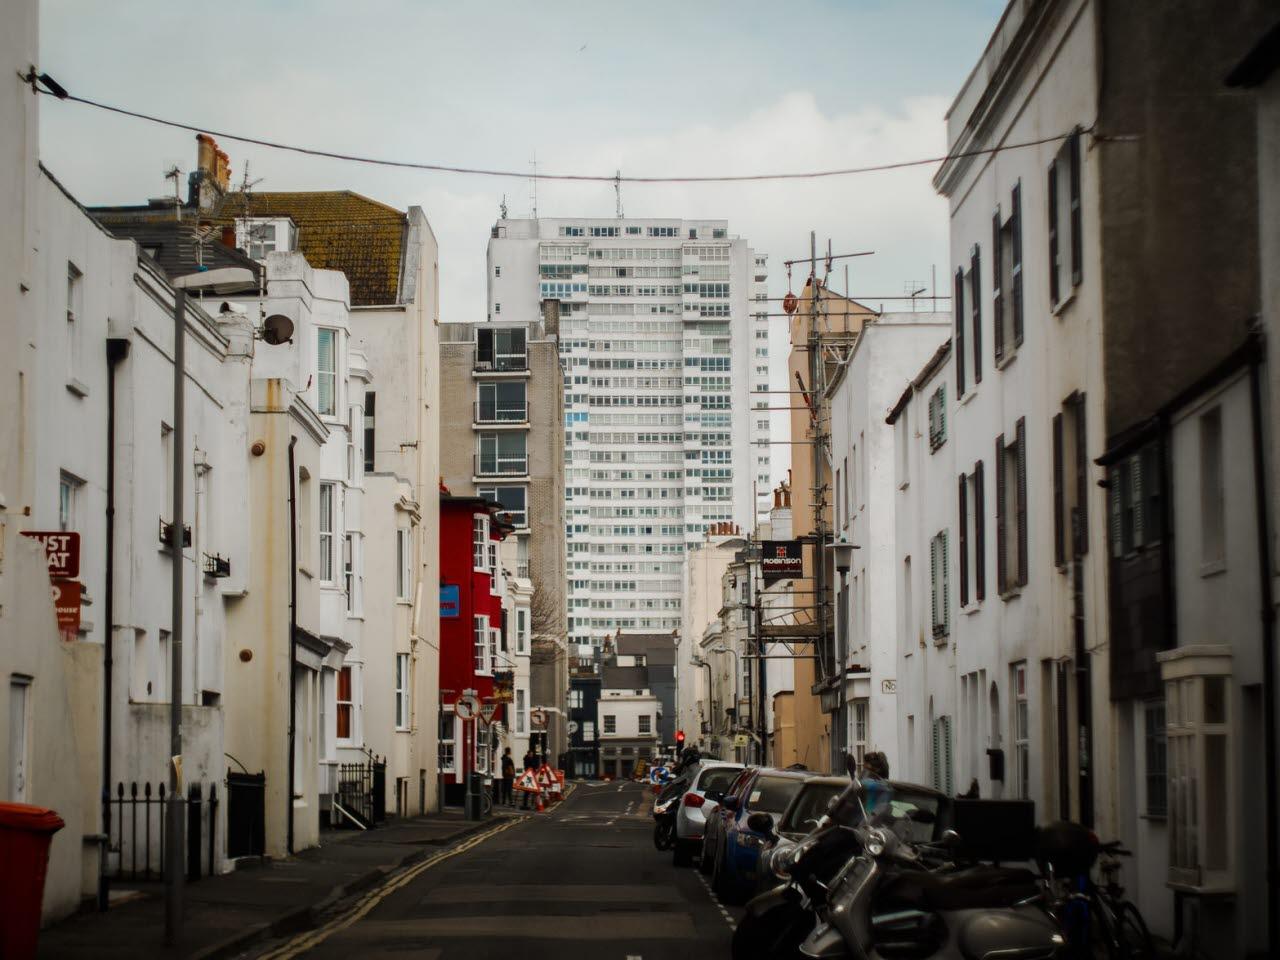 Residential houses in Brighton